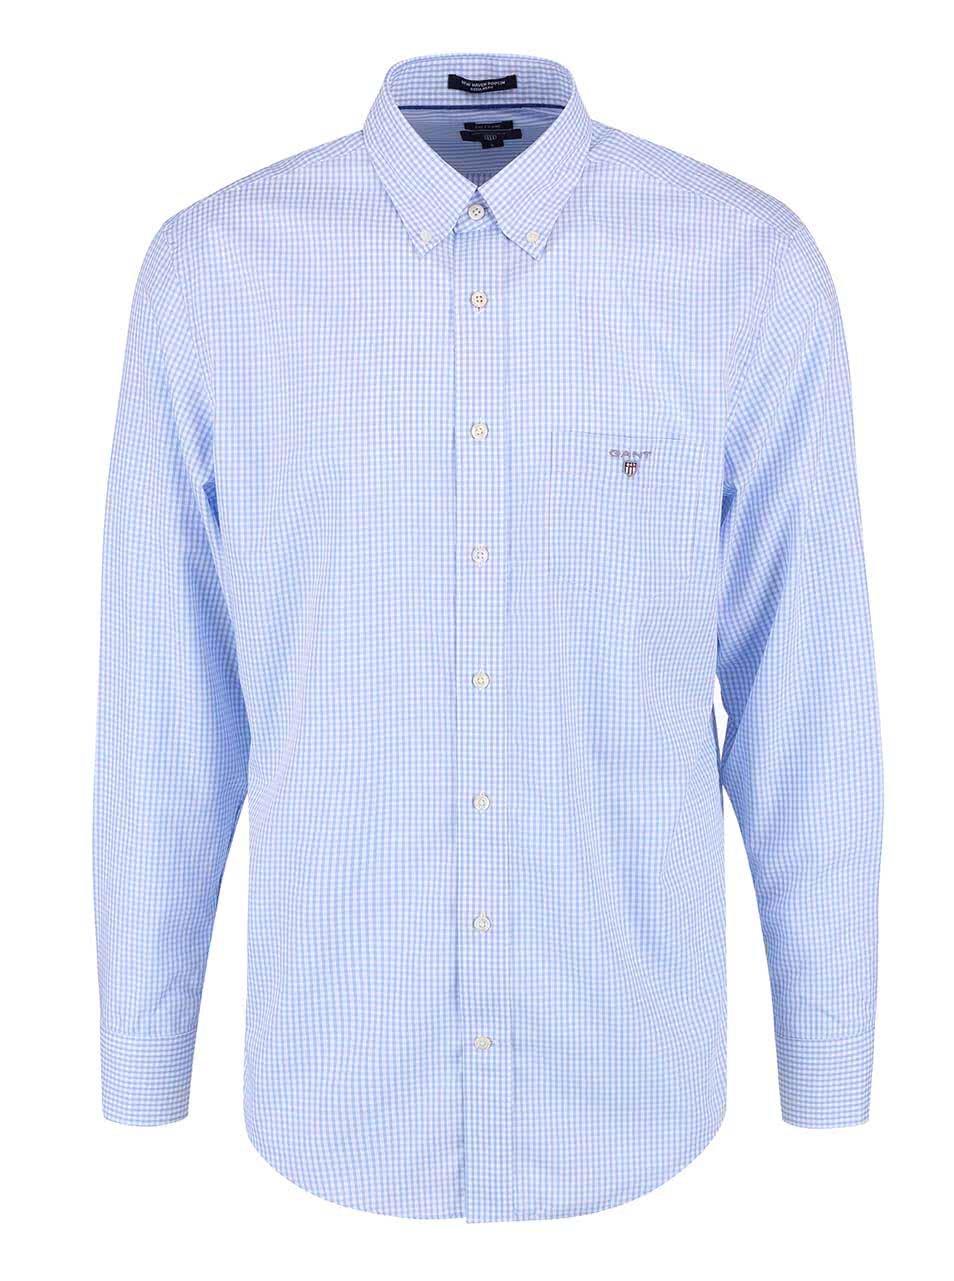 2ec86e41ed1a Modrá pánska kockovaná regular fit košeľa GANT ...